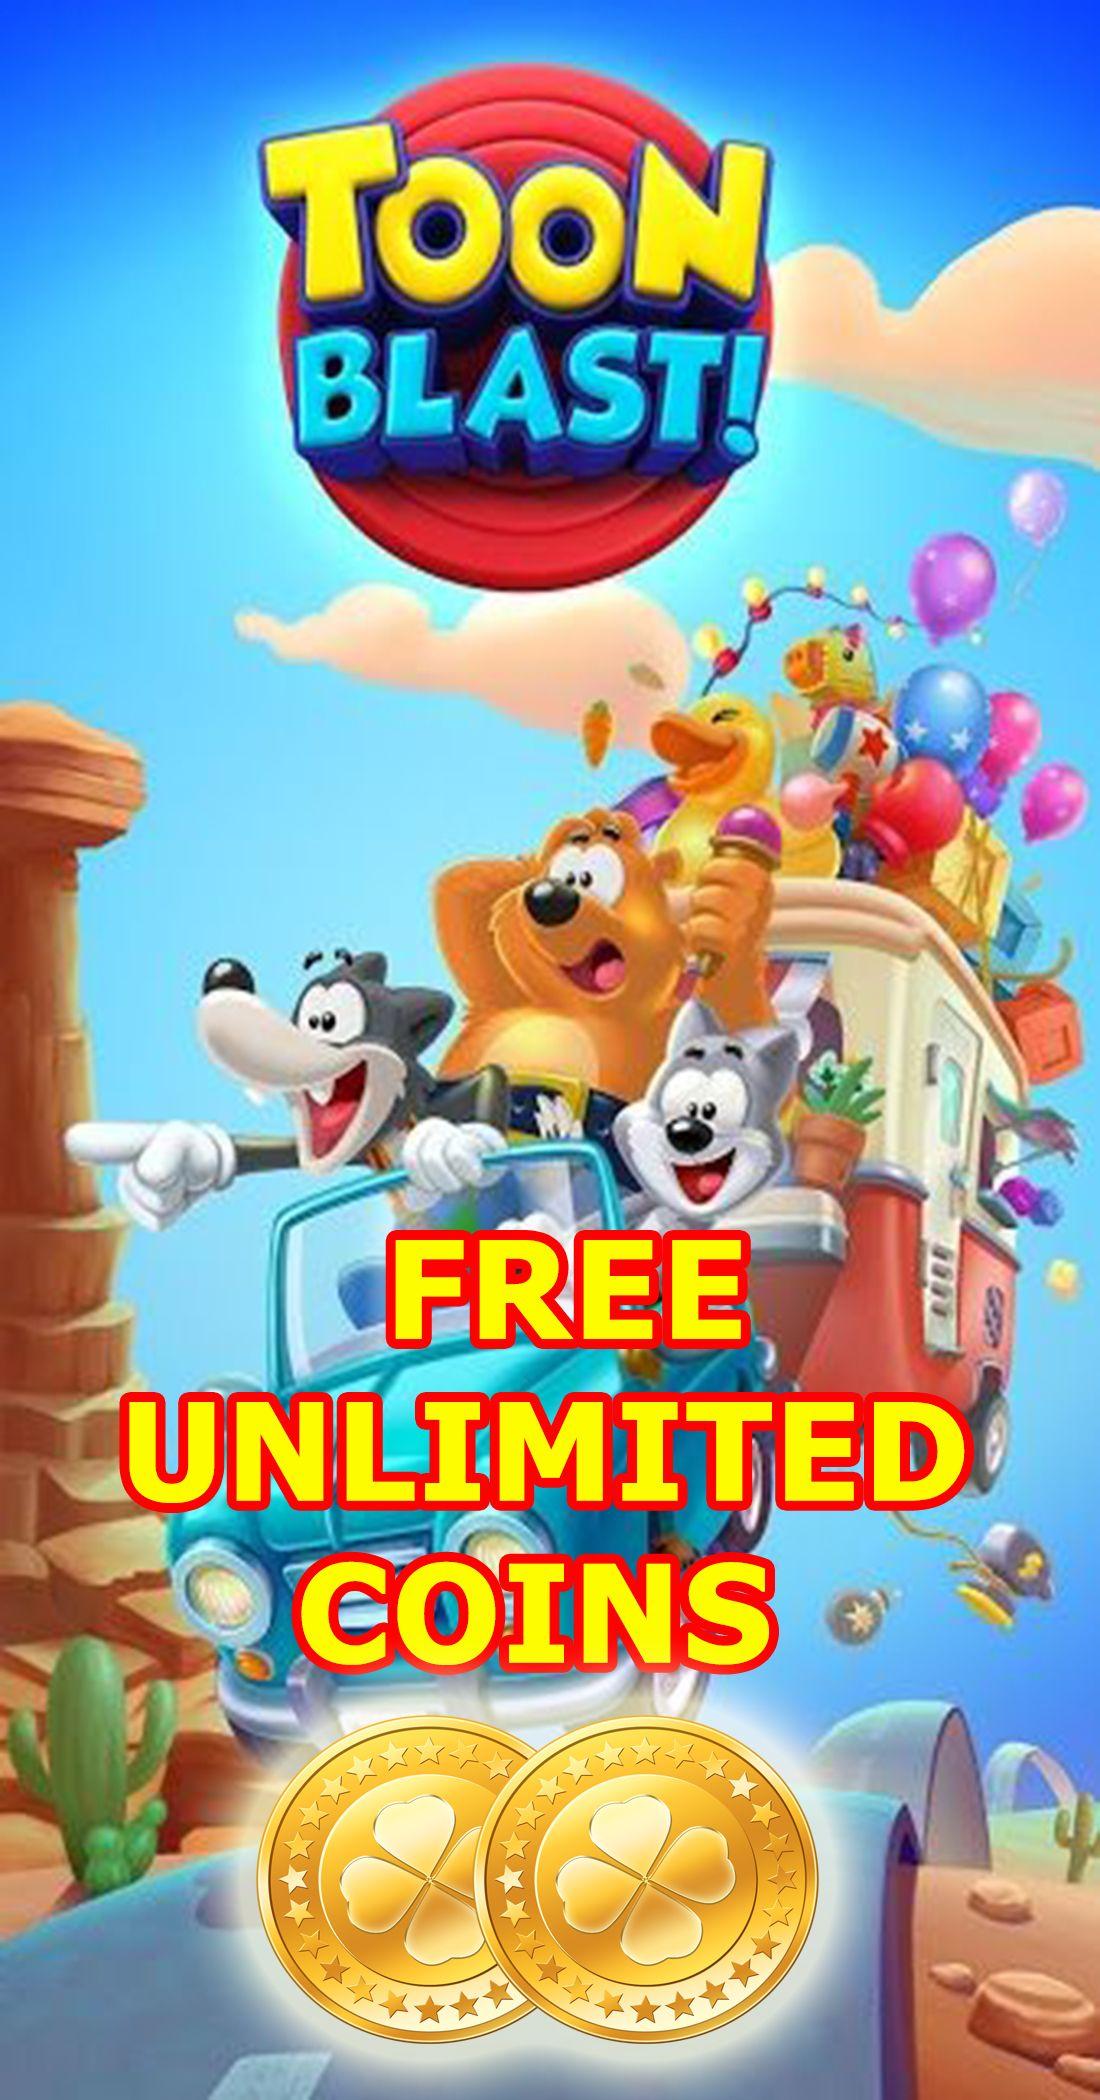 Toon blast free coins in 2020 Coins, Free episodes, Got game